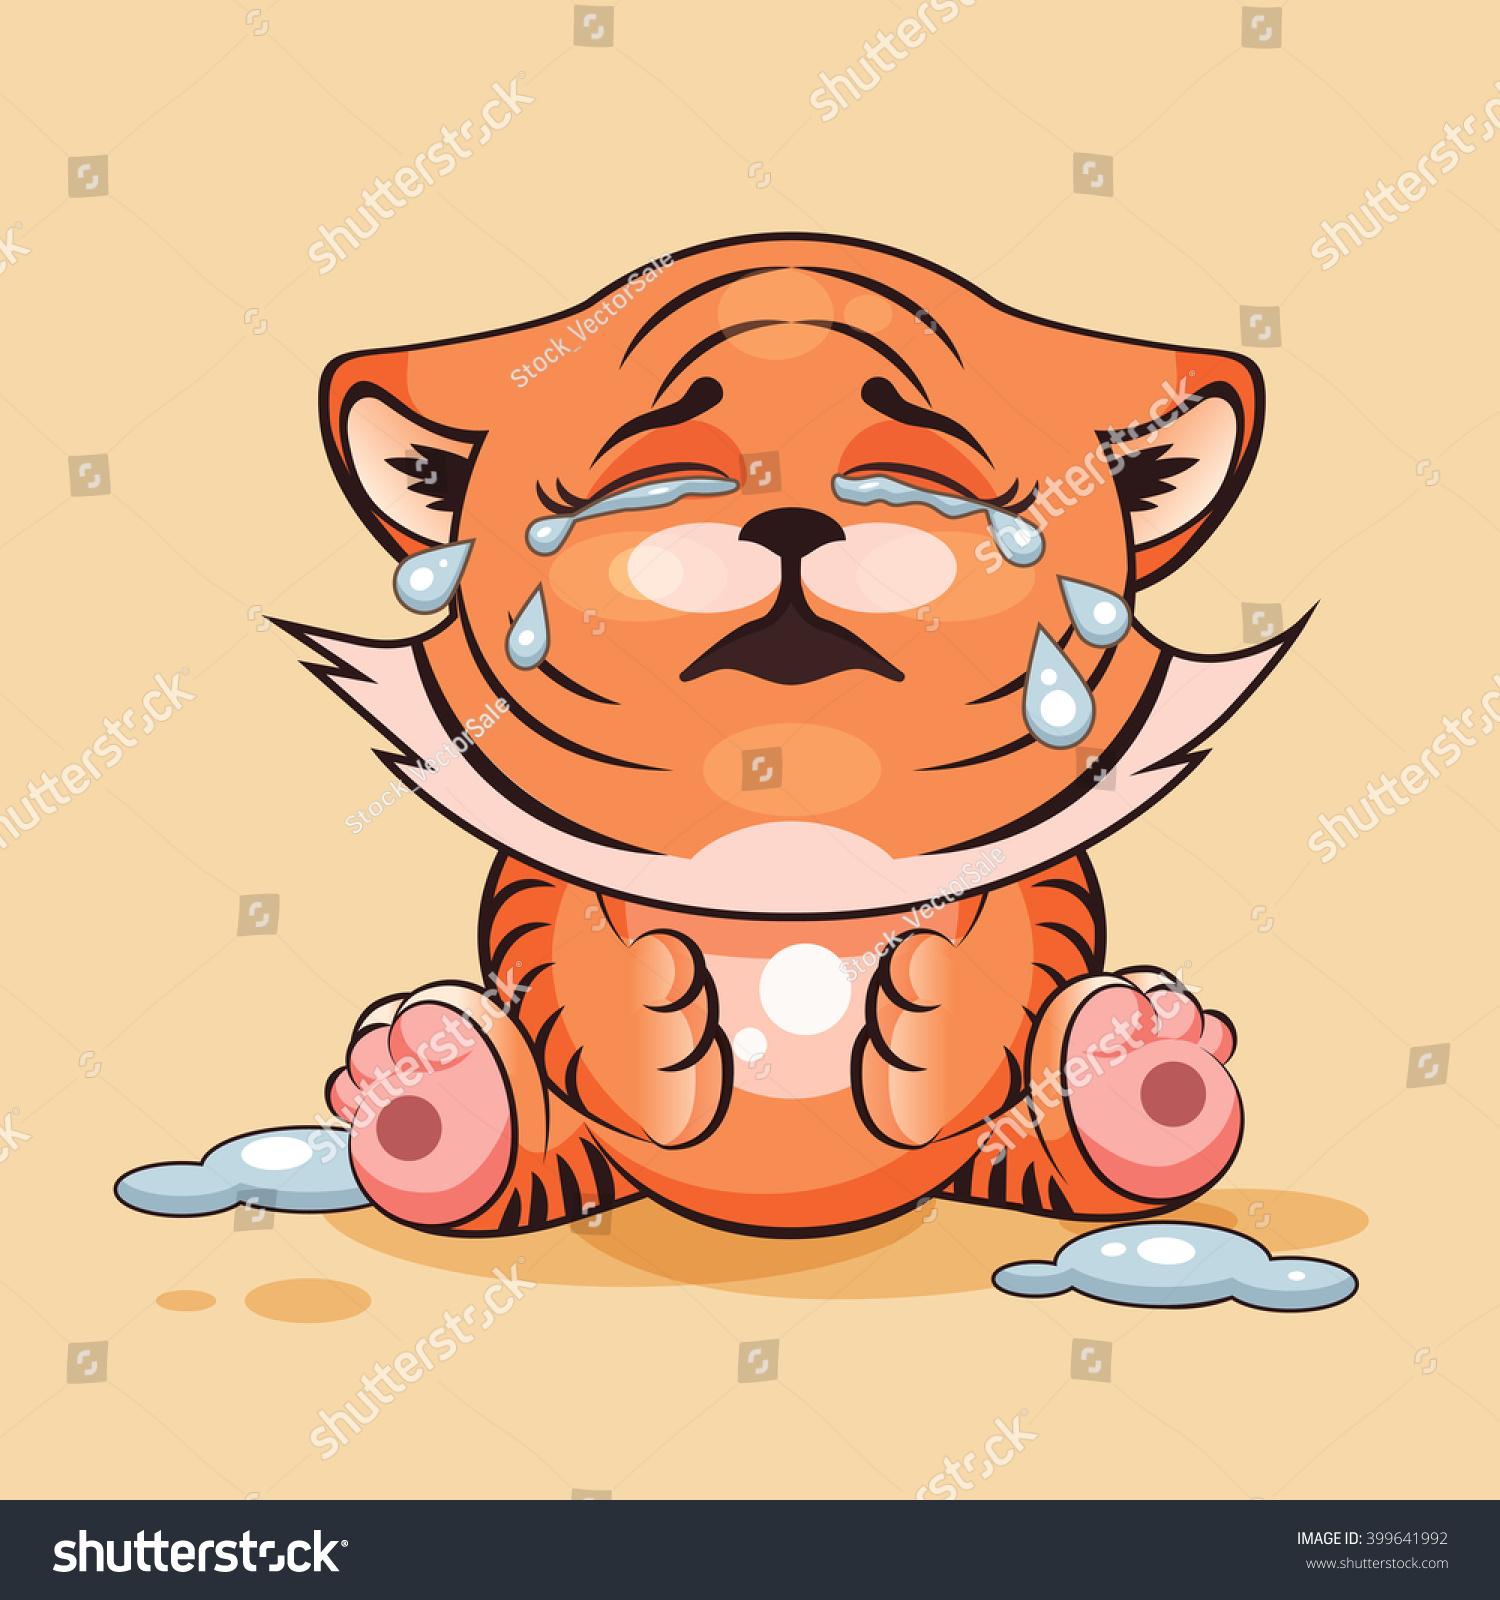 Cartoon Characters Crying : Vector stock illustration isolated emoji character